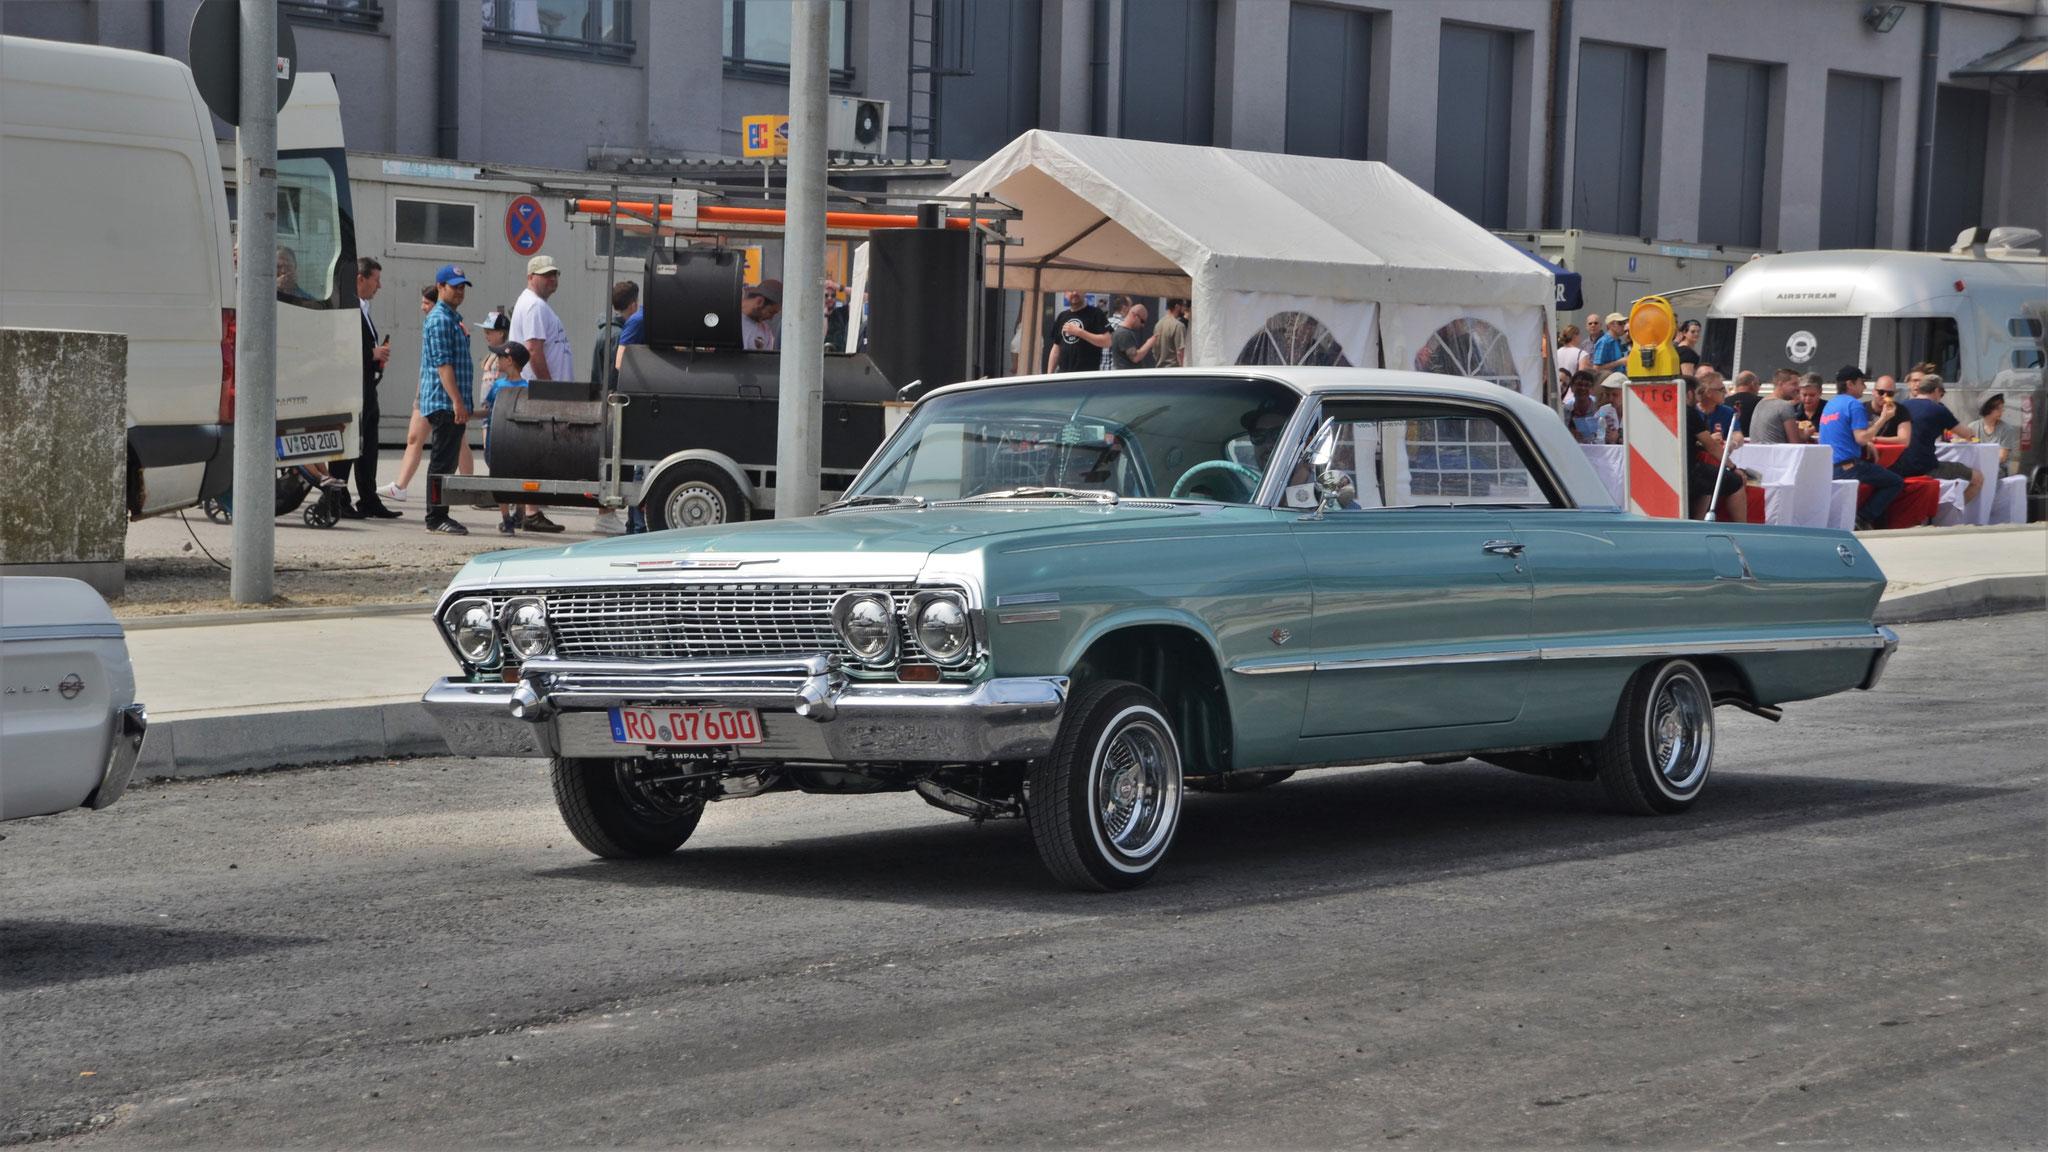 Chevrolet Impala Low Rider - RO-07600